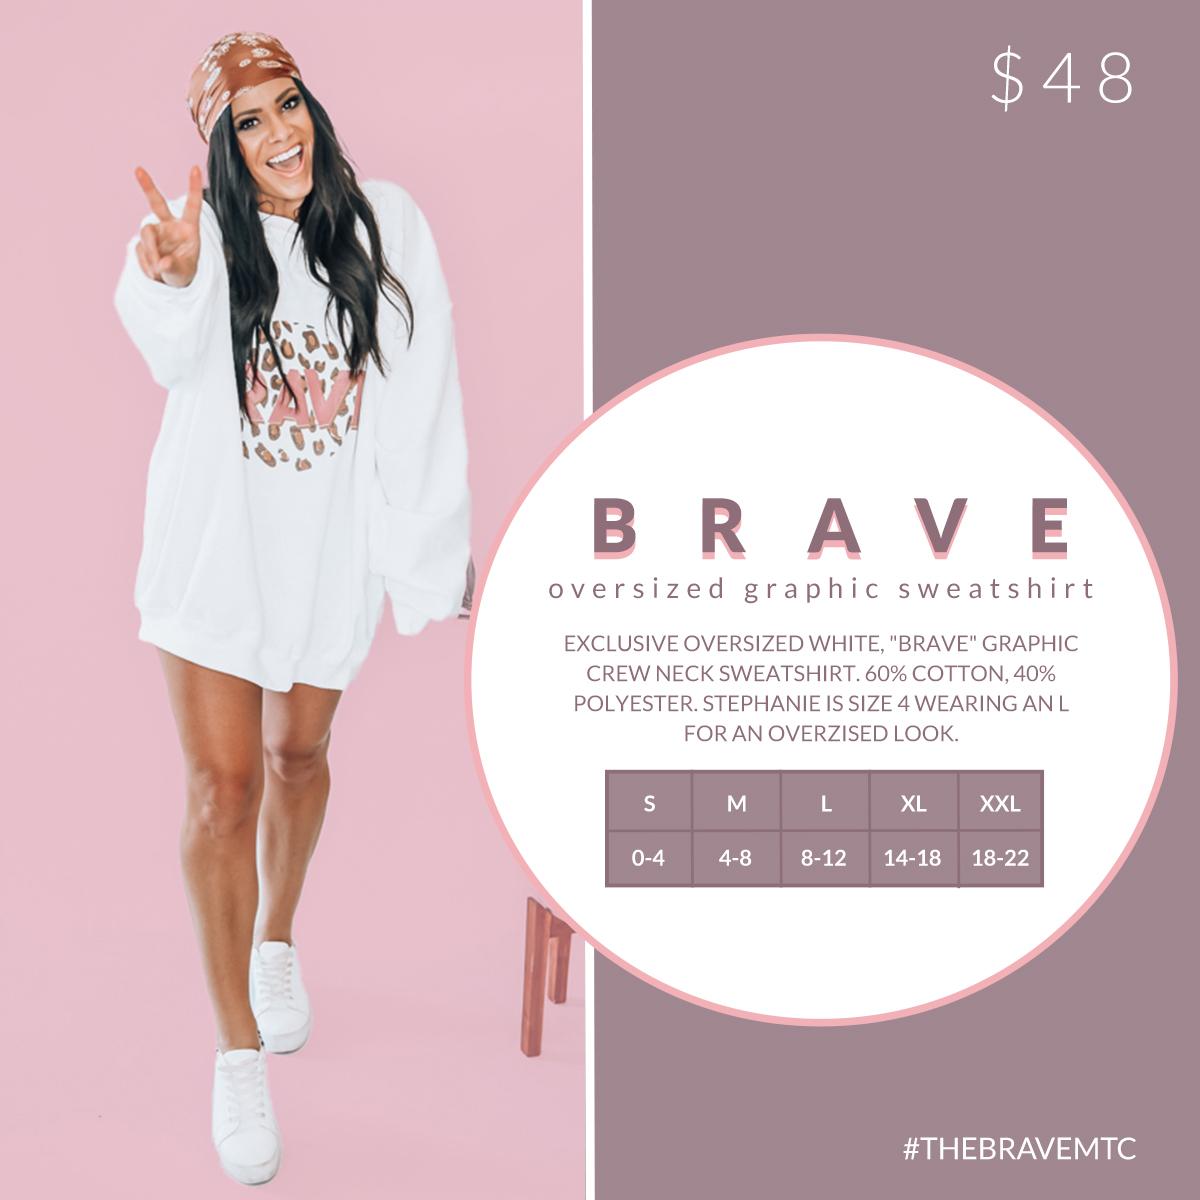 Image for BRAVE